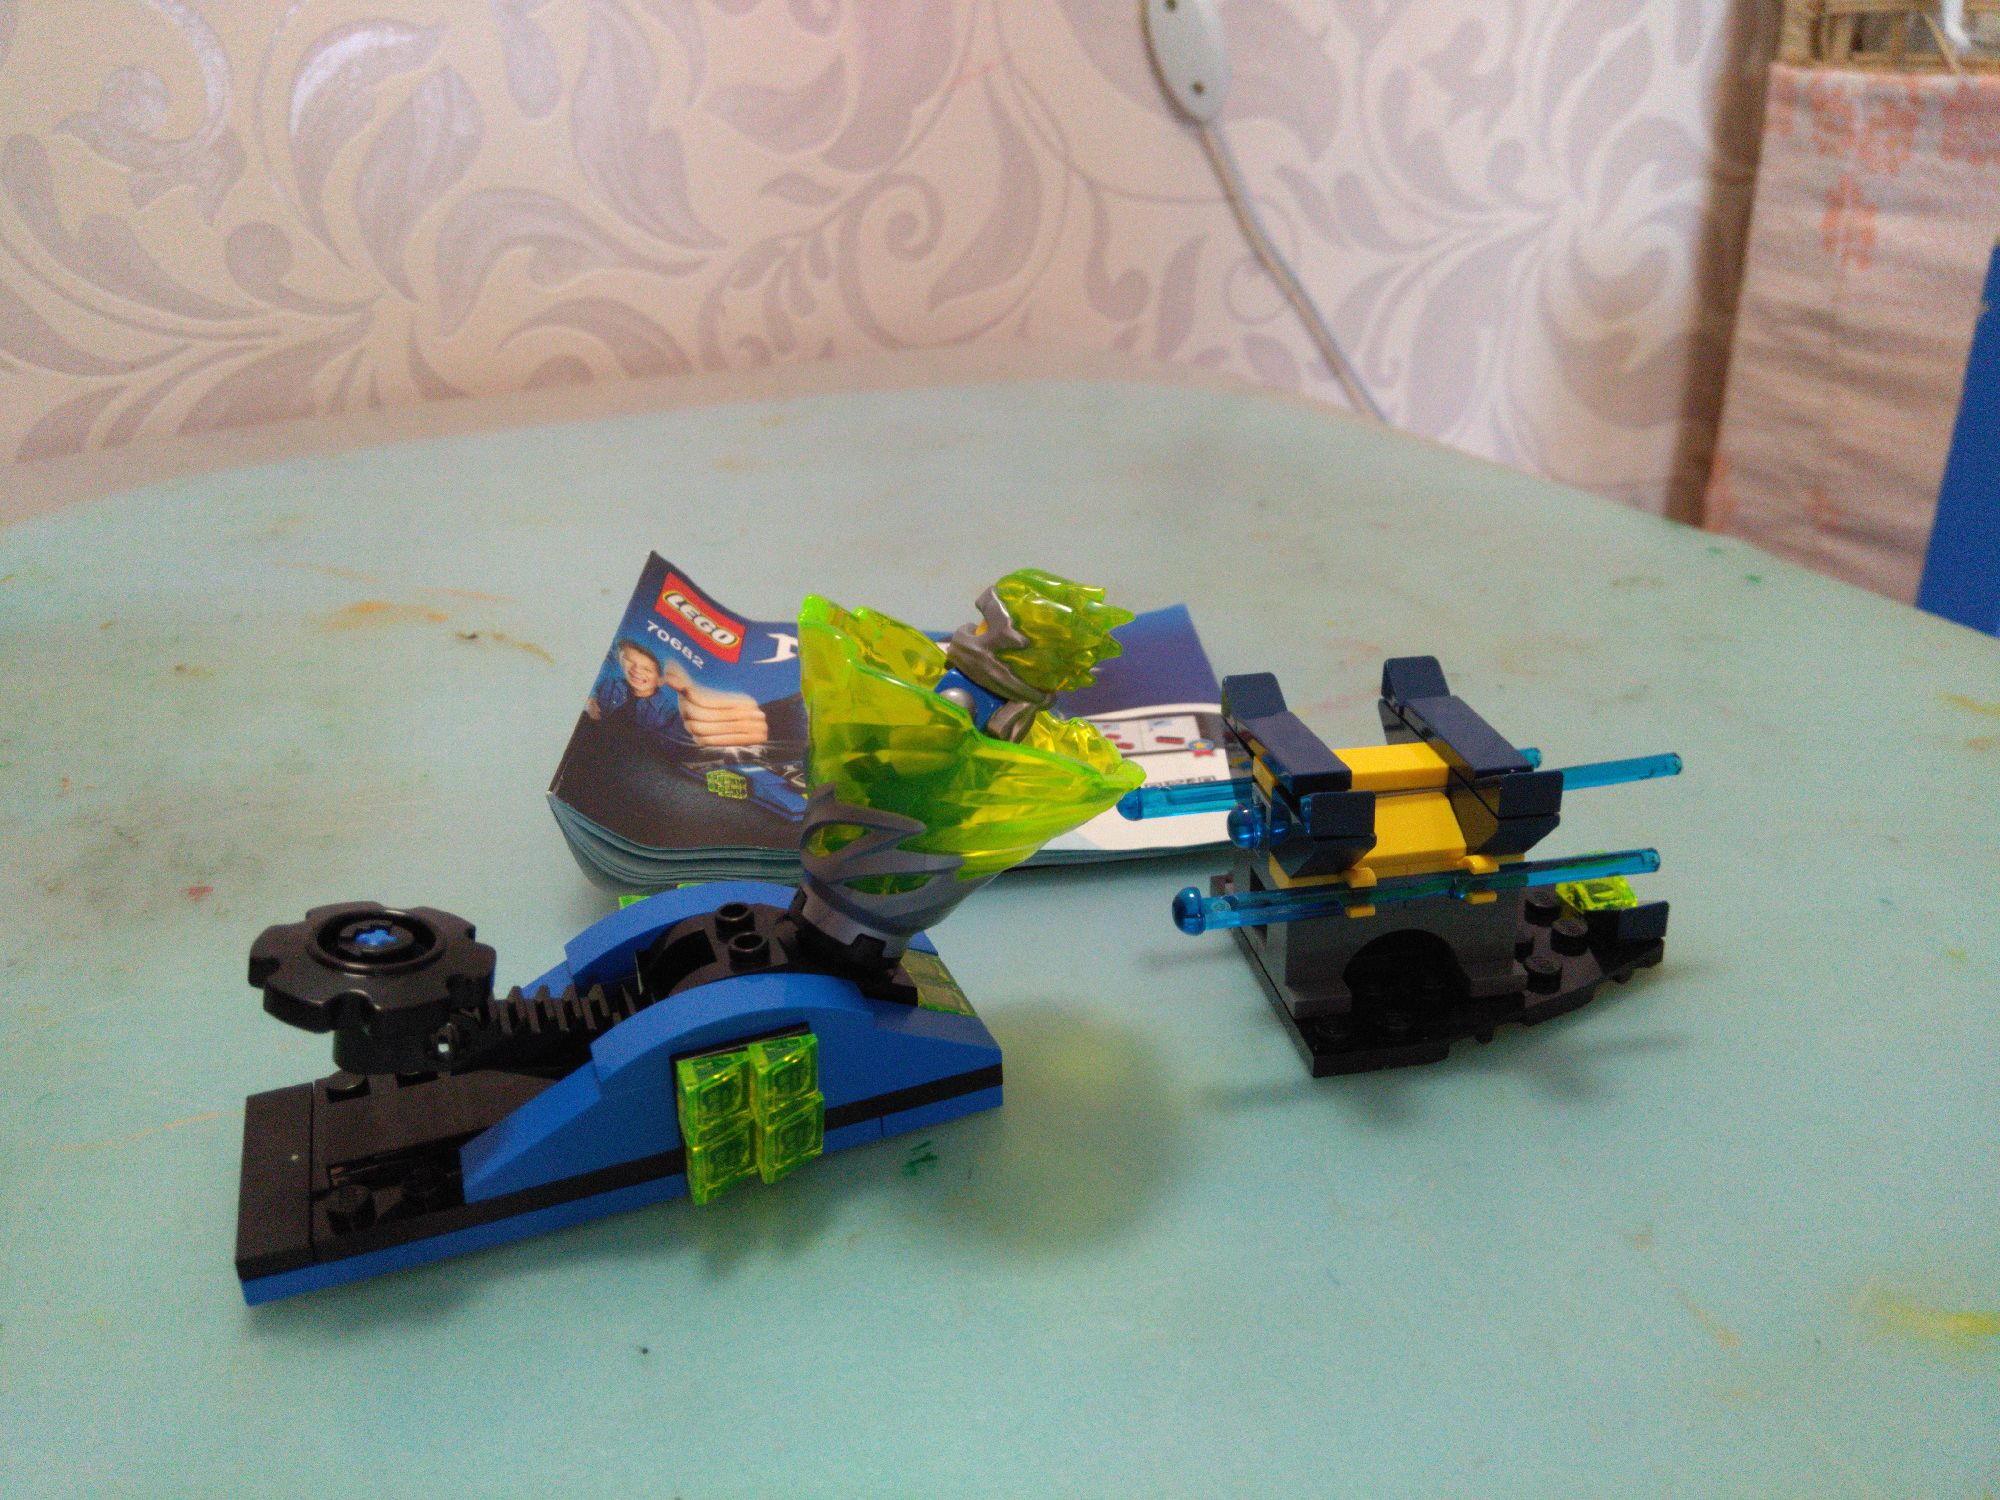 Волчок и катапульта из NinjaGo